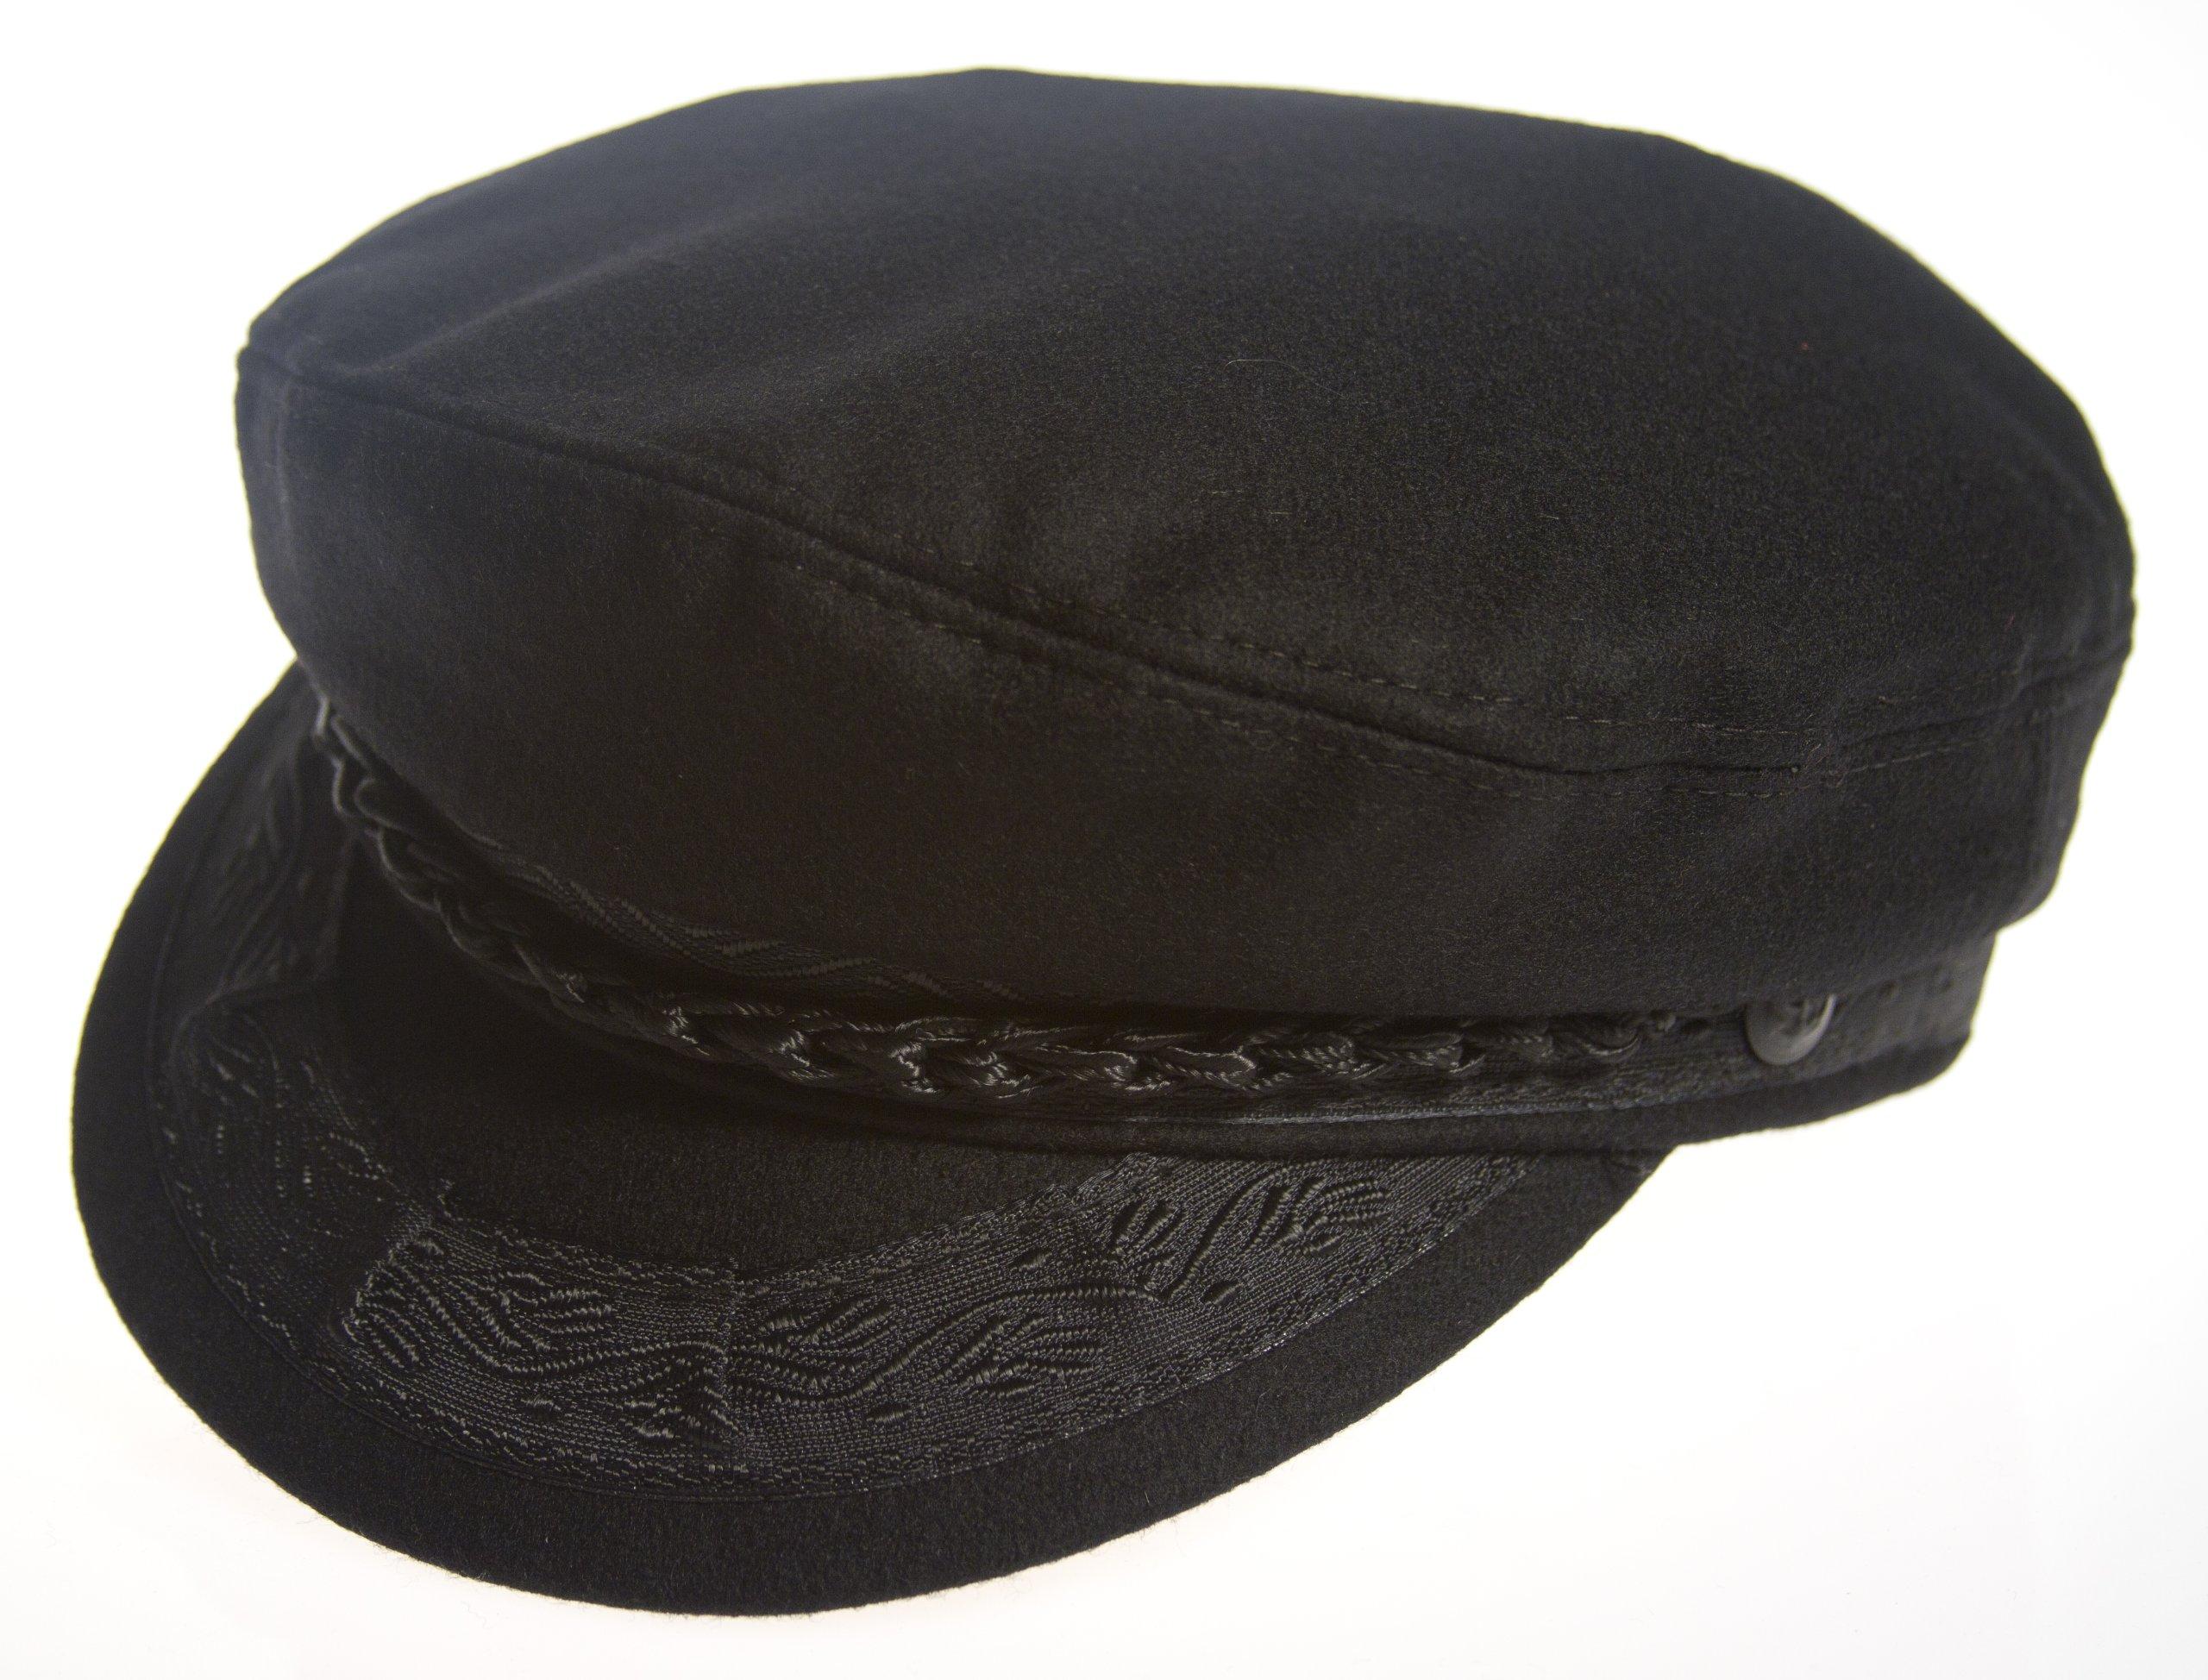 Aegean Authentic Greek Fisherman's Cap - Wool - Black - Size 56 - (7)